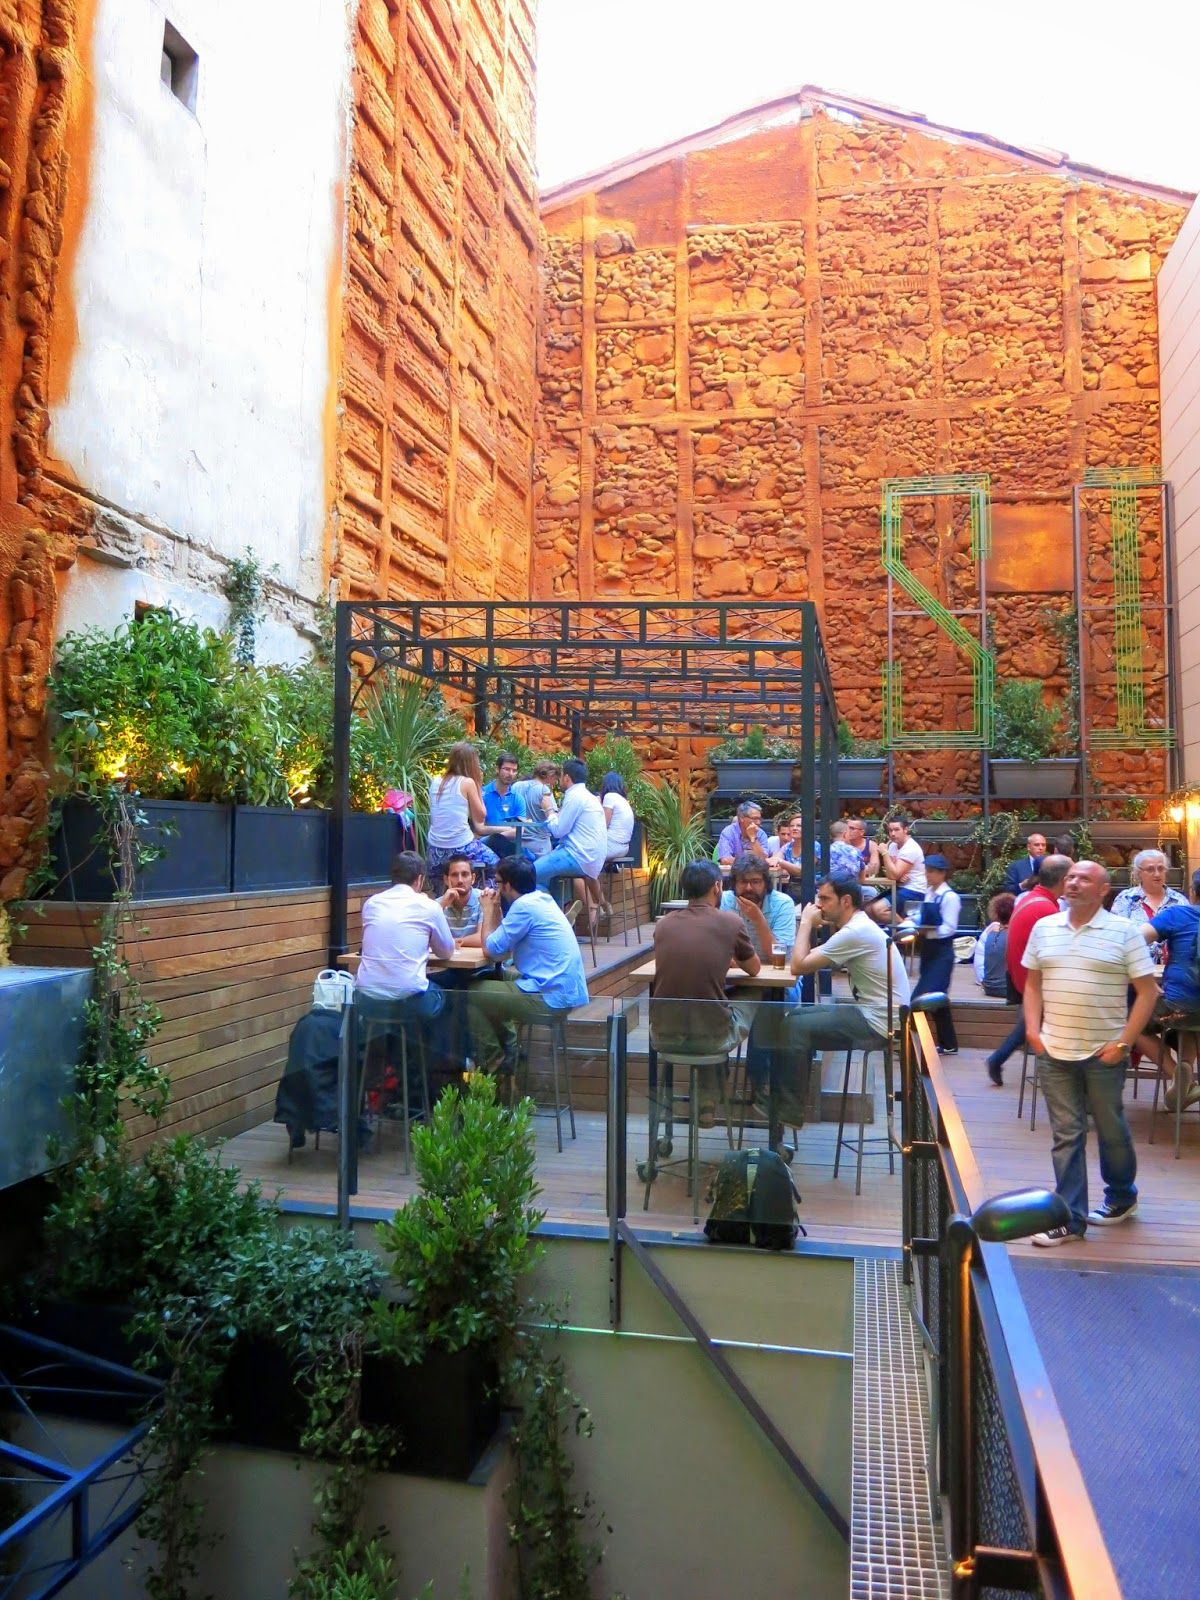 Terraza Del Mercado De San Ildefonso Madrid Terraza Madre Restaurantes